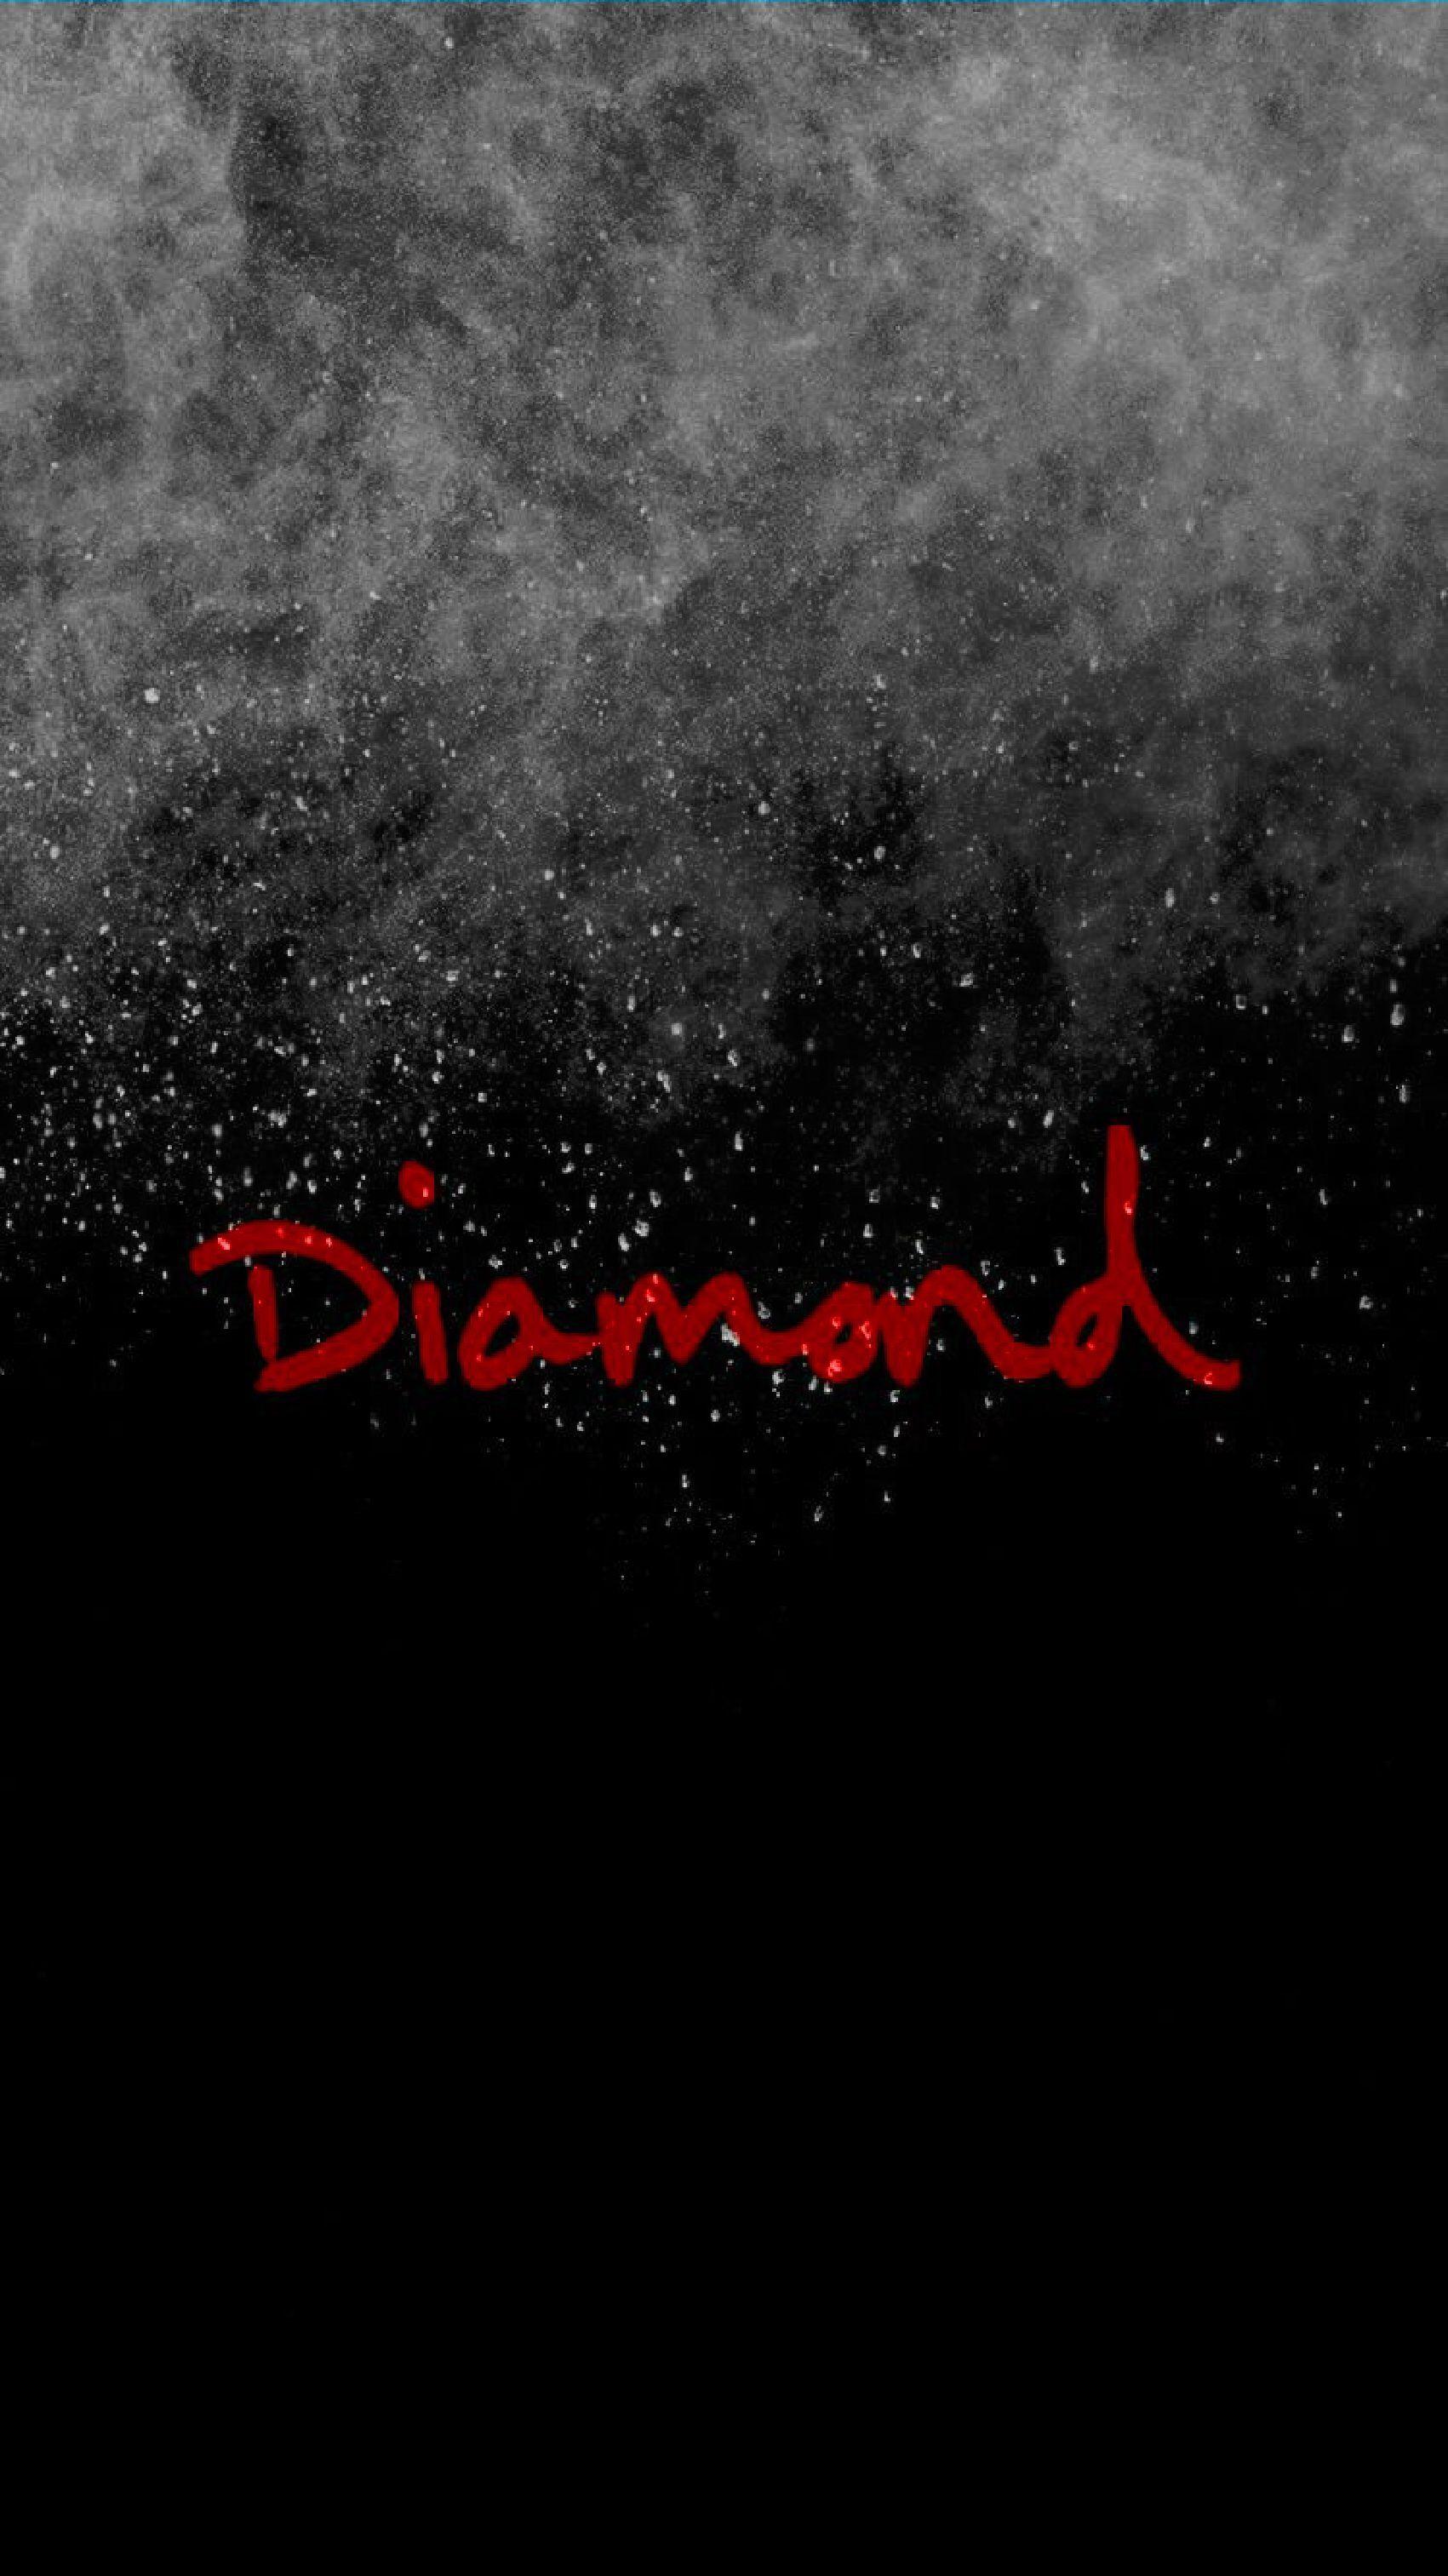 Liftedmiles Diamond Supply Co Diamond Supply Co Wallpaper Diamond Supply Co Diamond Supply